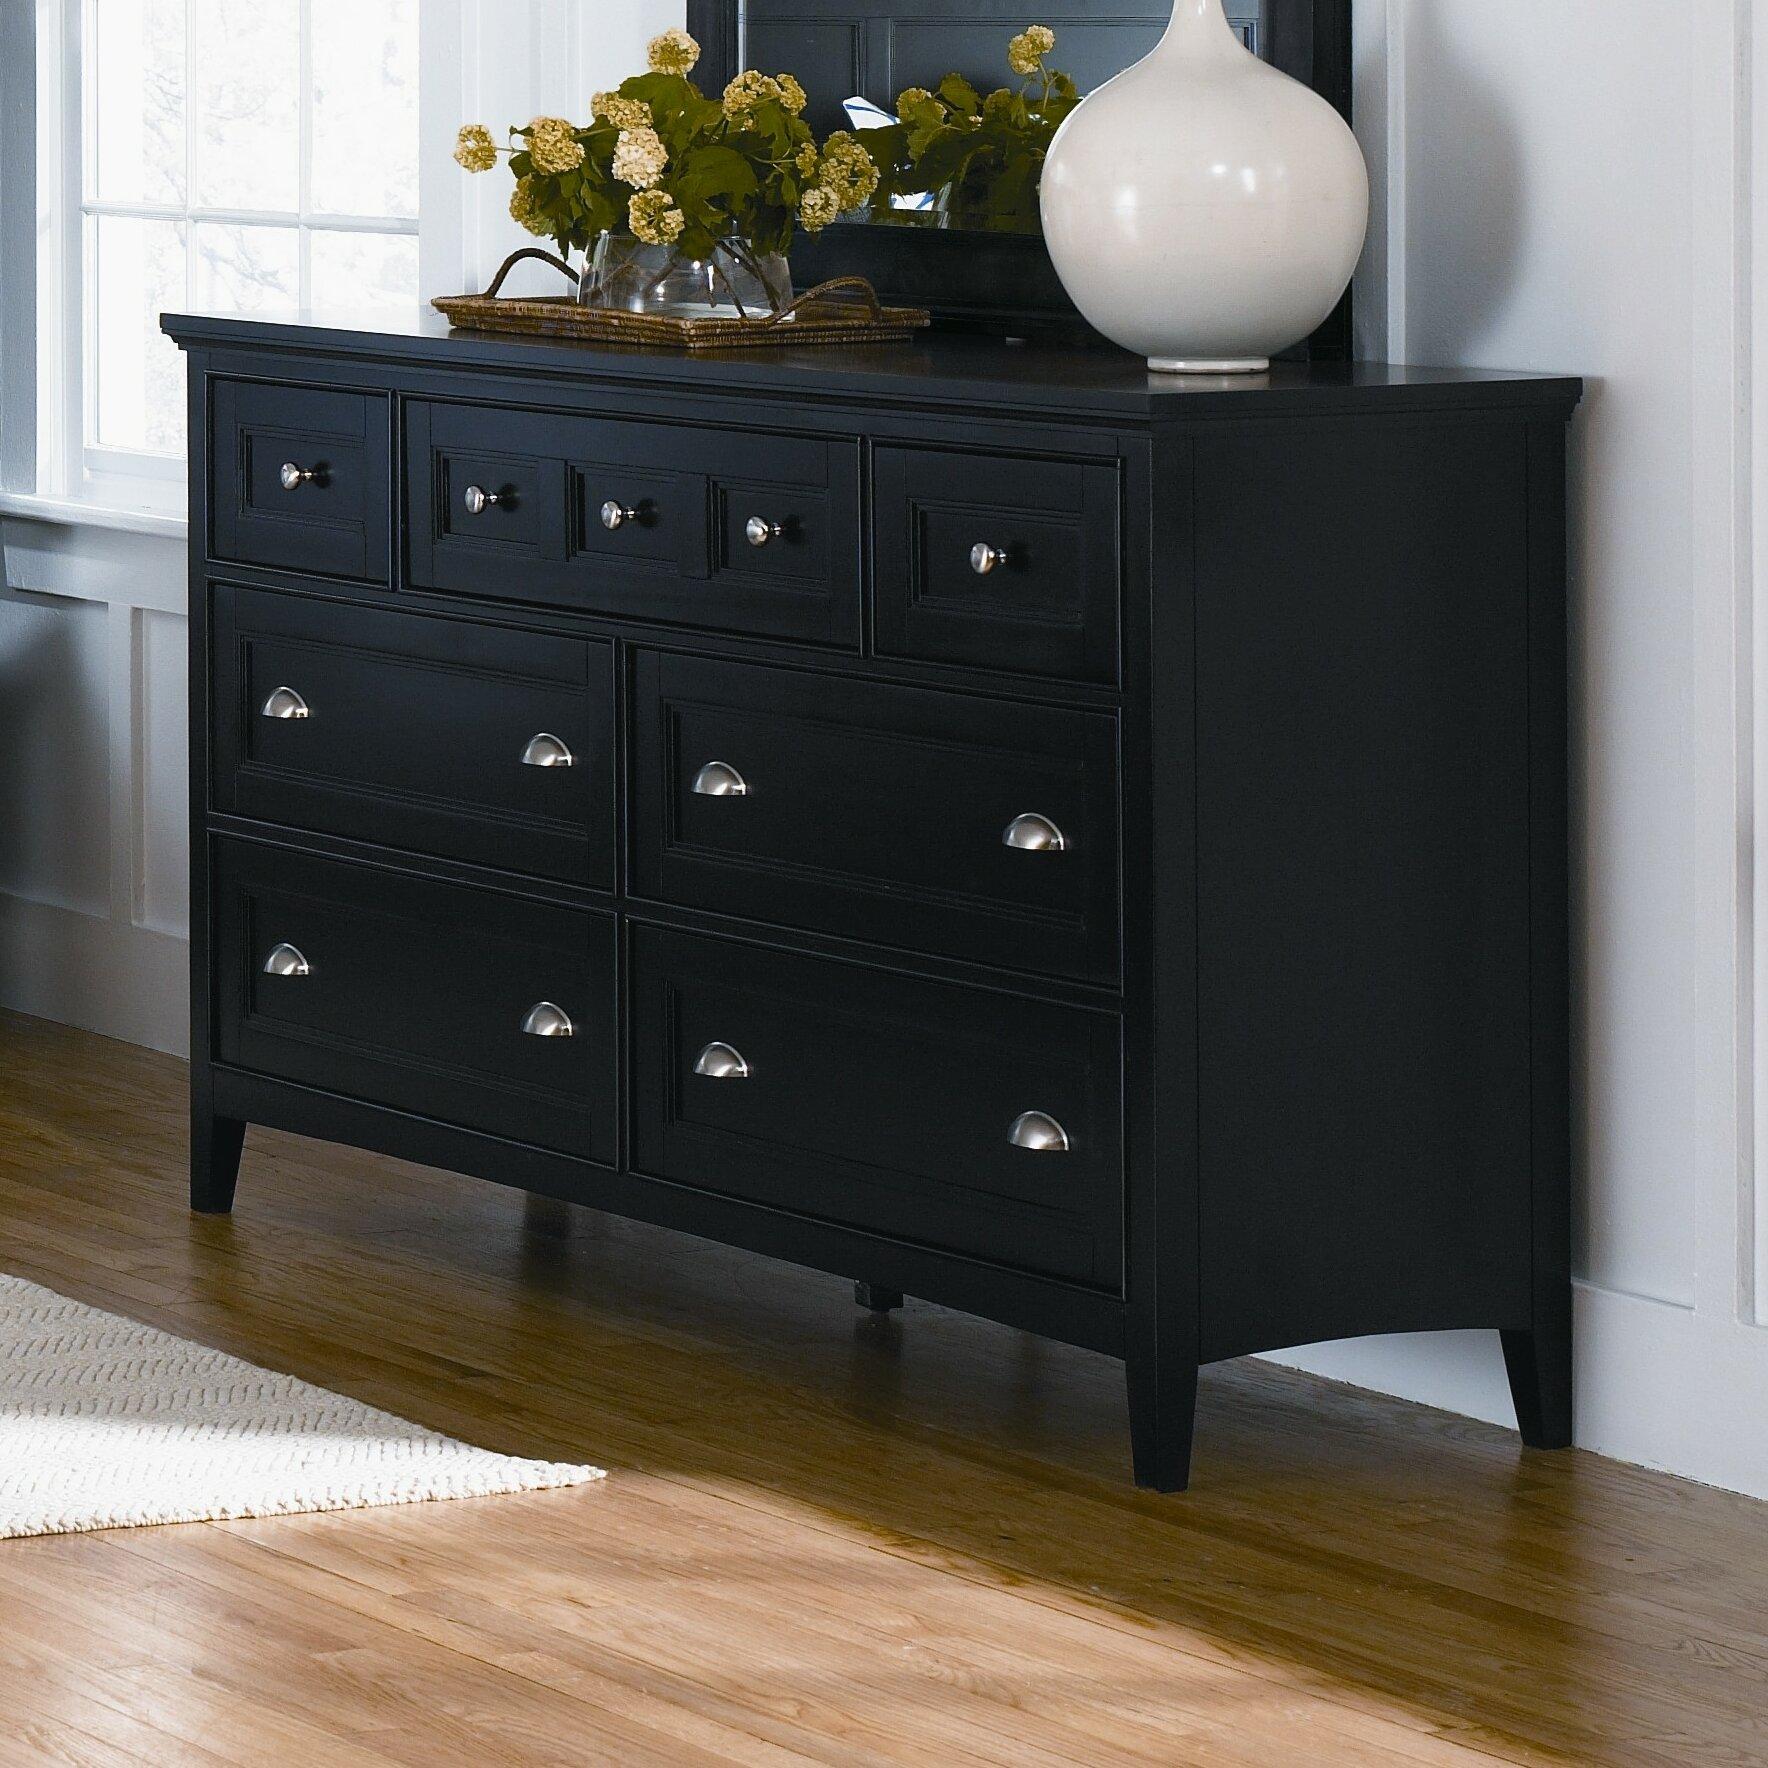 Magnussen South Hampton 7 Drawer Double Dresser Reviews Wayfair